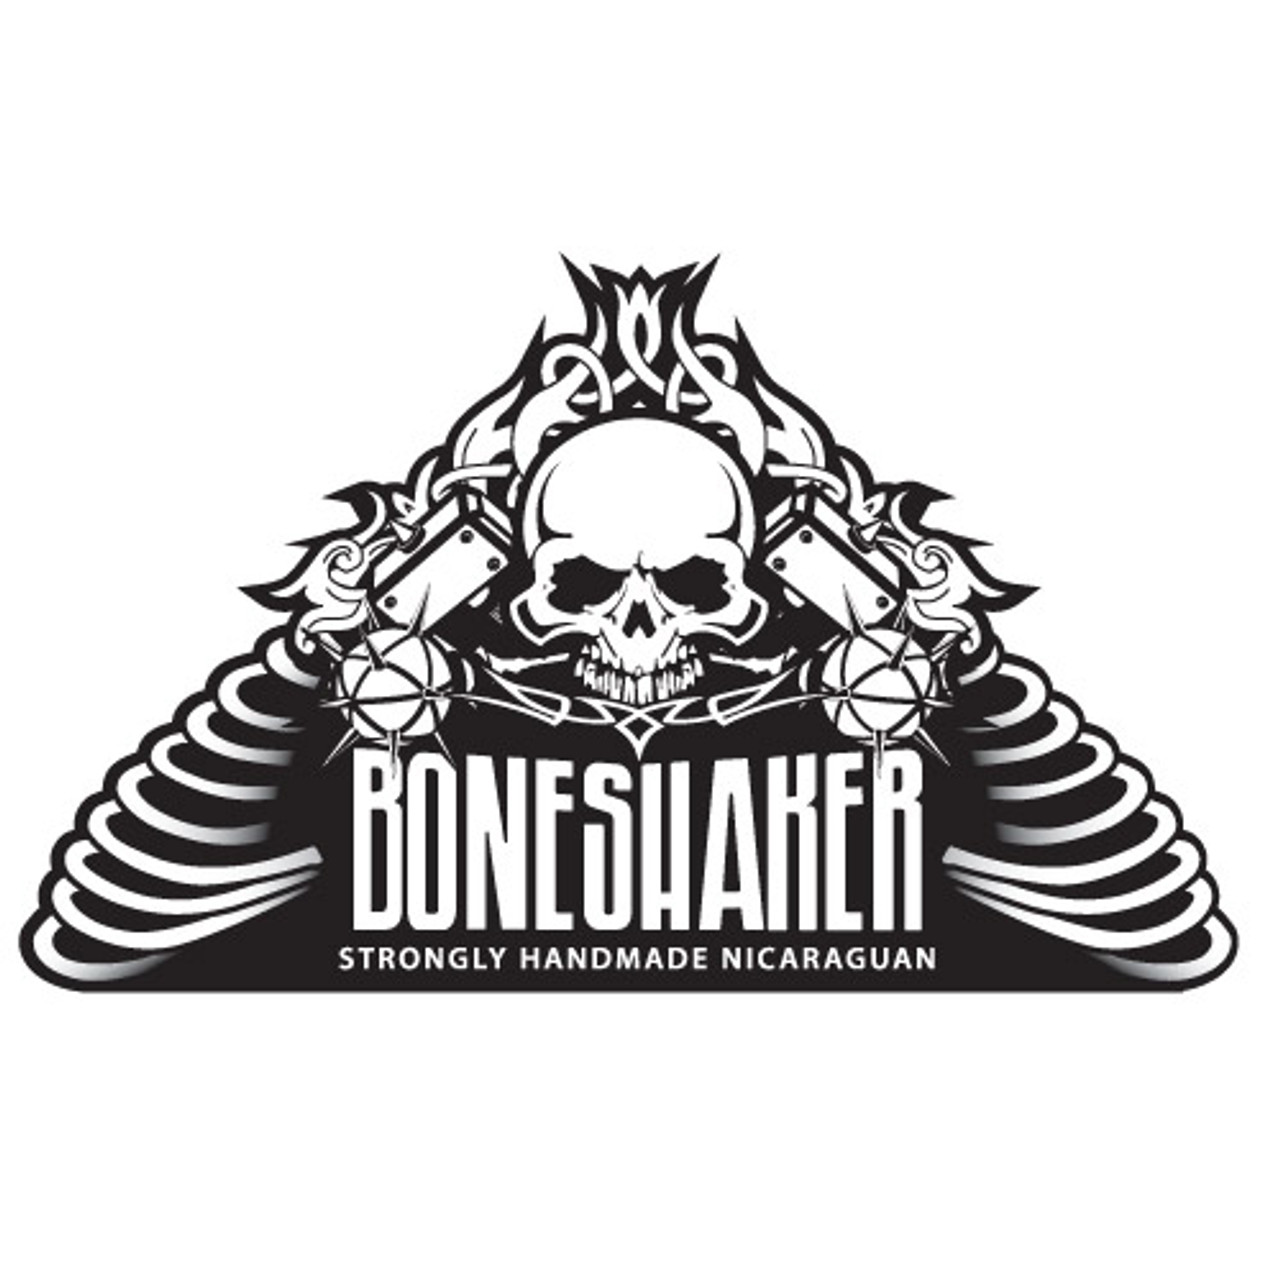 Boneshaker War Hammer Cigars - 6 x 60 (Box of 20)